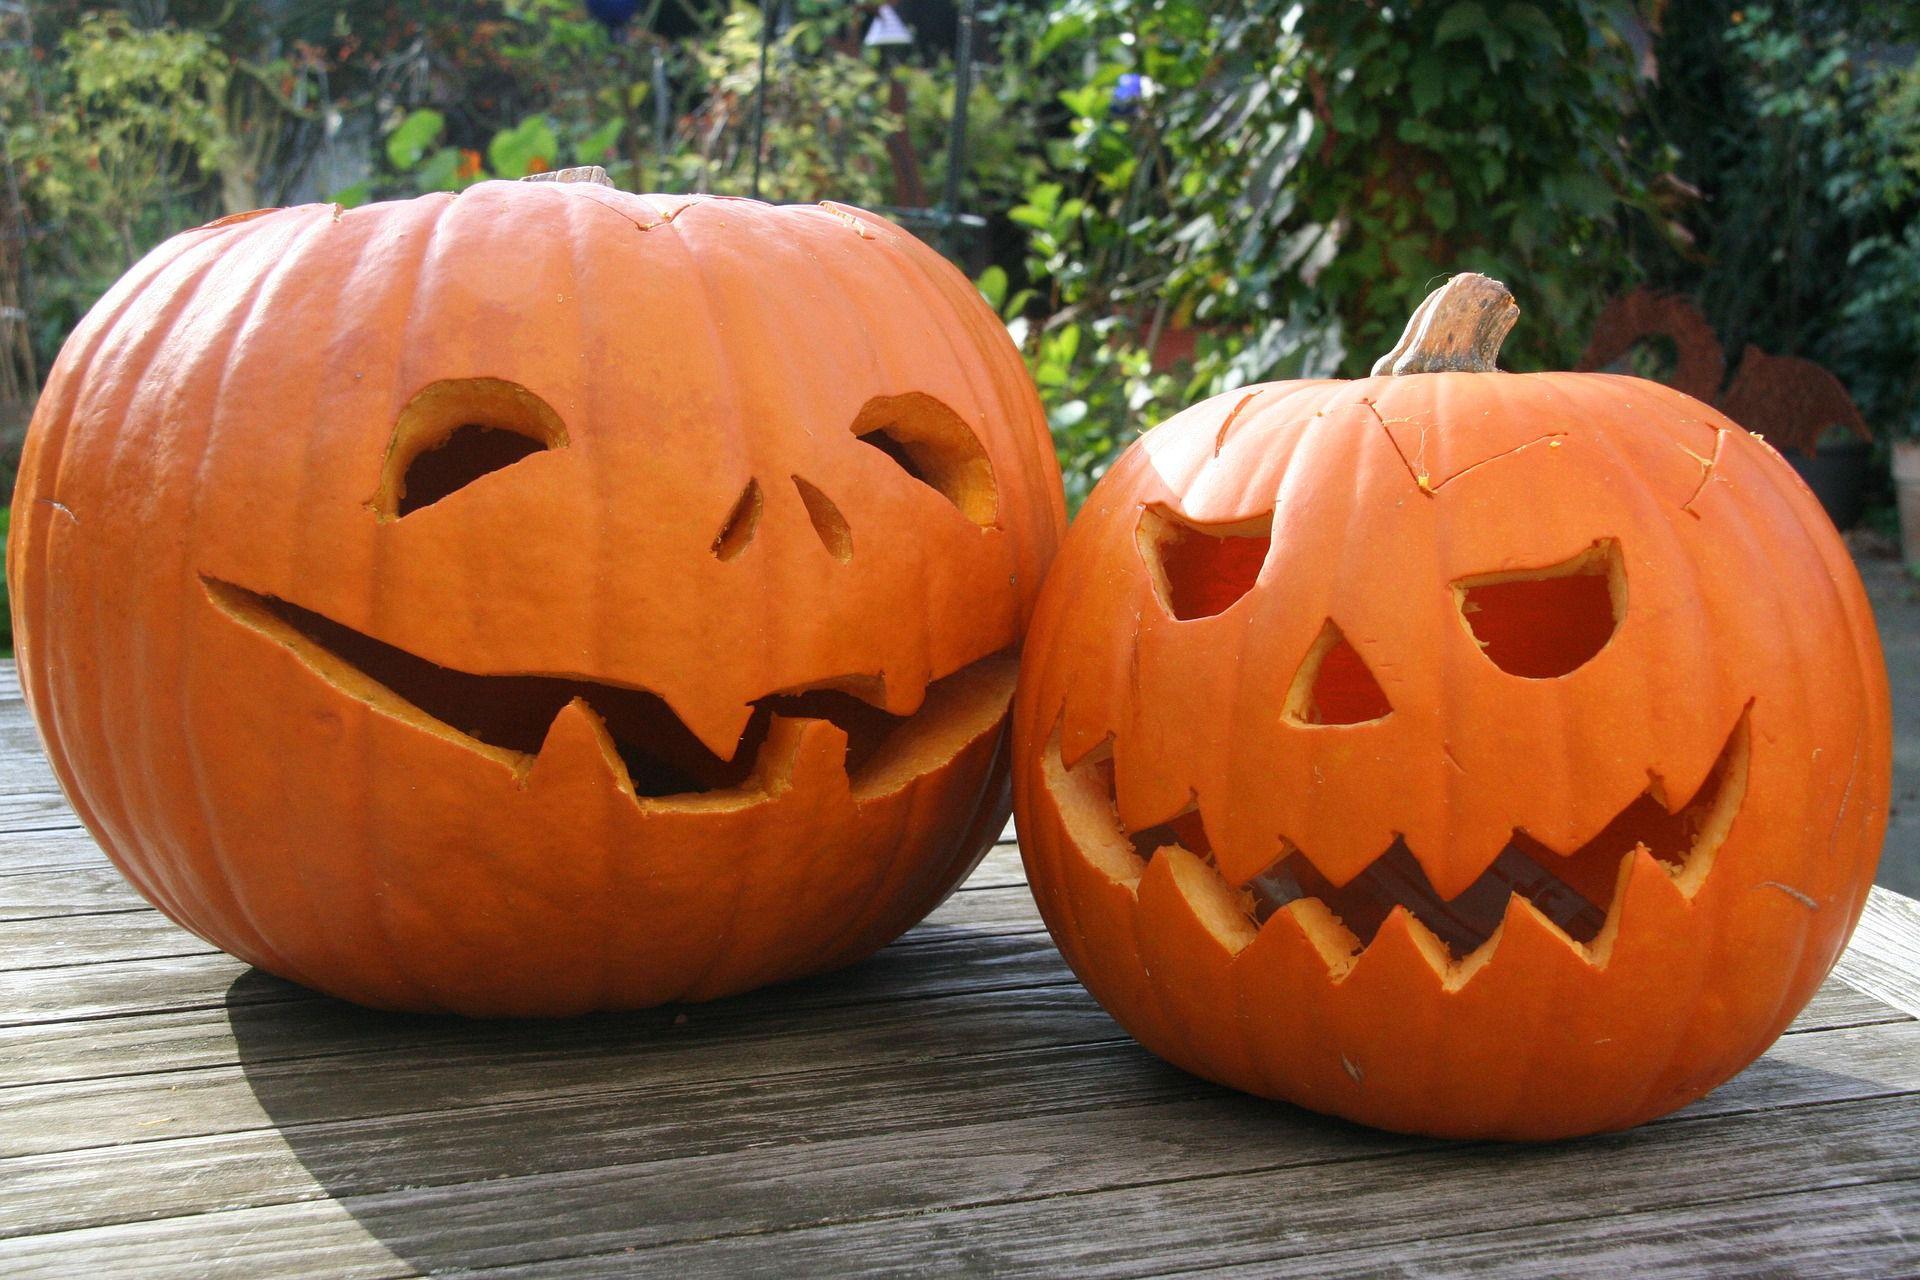 Free patterns . Elvis clipart pumpkin carving